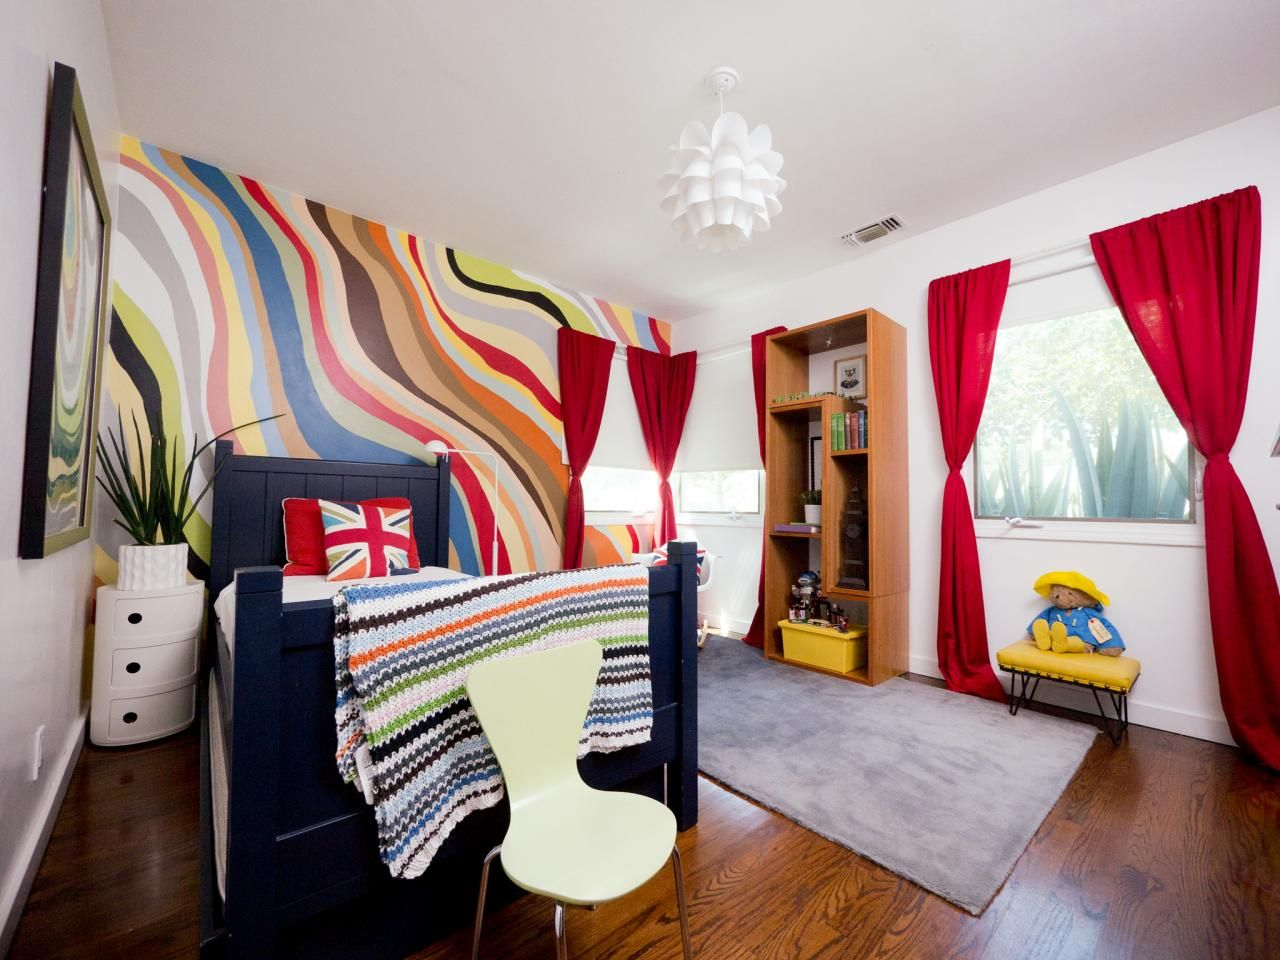 Amazing Kids Rooms Gallery of Amazing